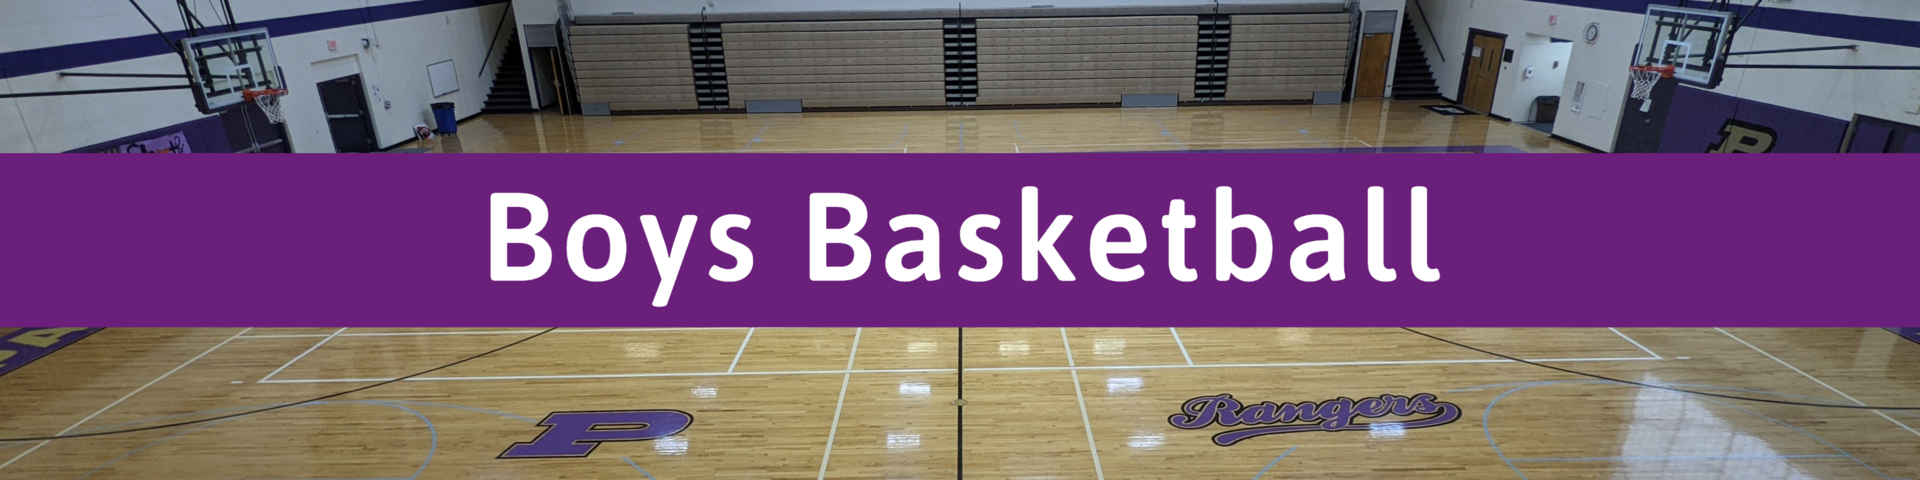 Boys Basketball header